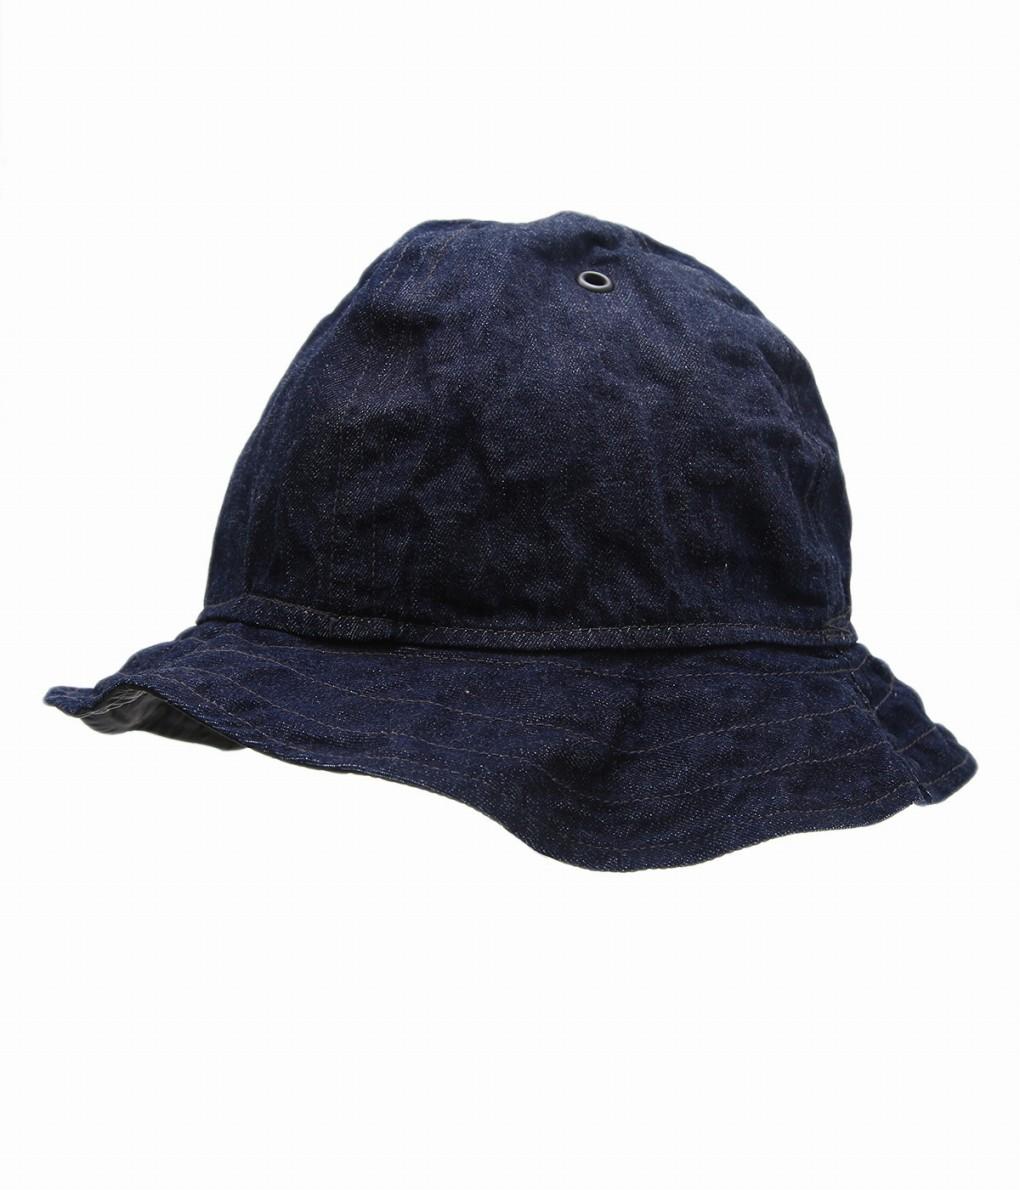 CORONA / コロナ : LUCY TAILOR・HAND MADE・REVERSIBLE UTICA HAT : コロナ 帽子 ハット メンズ : CA005-20-03【AST】